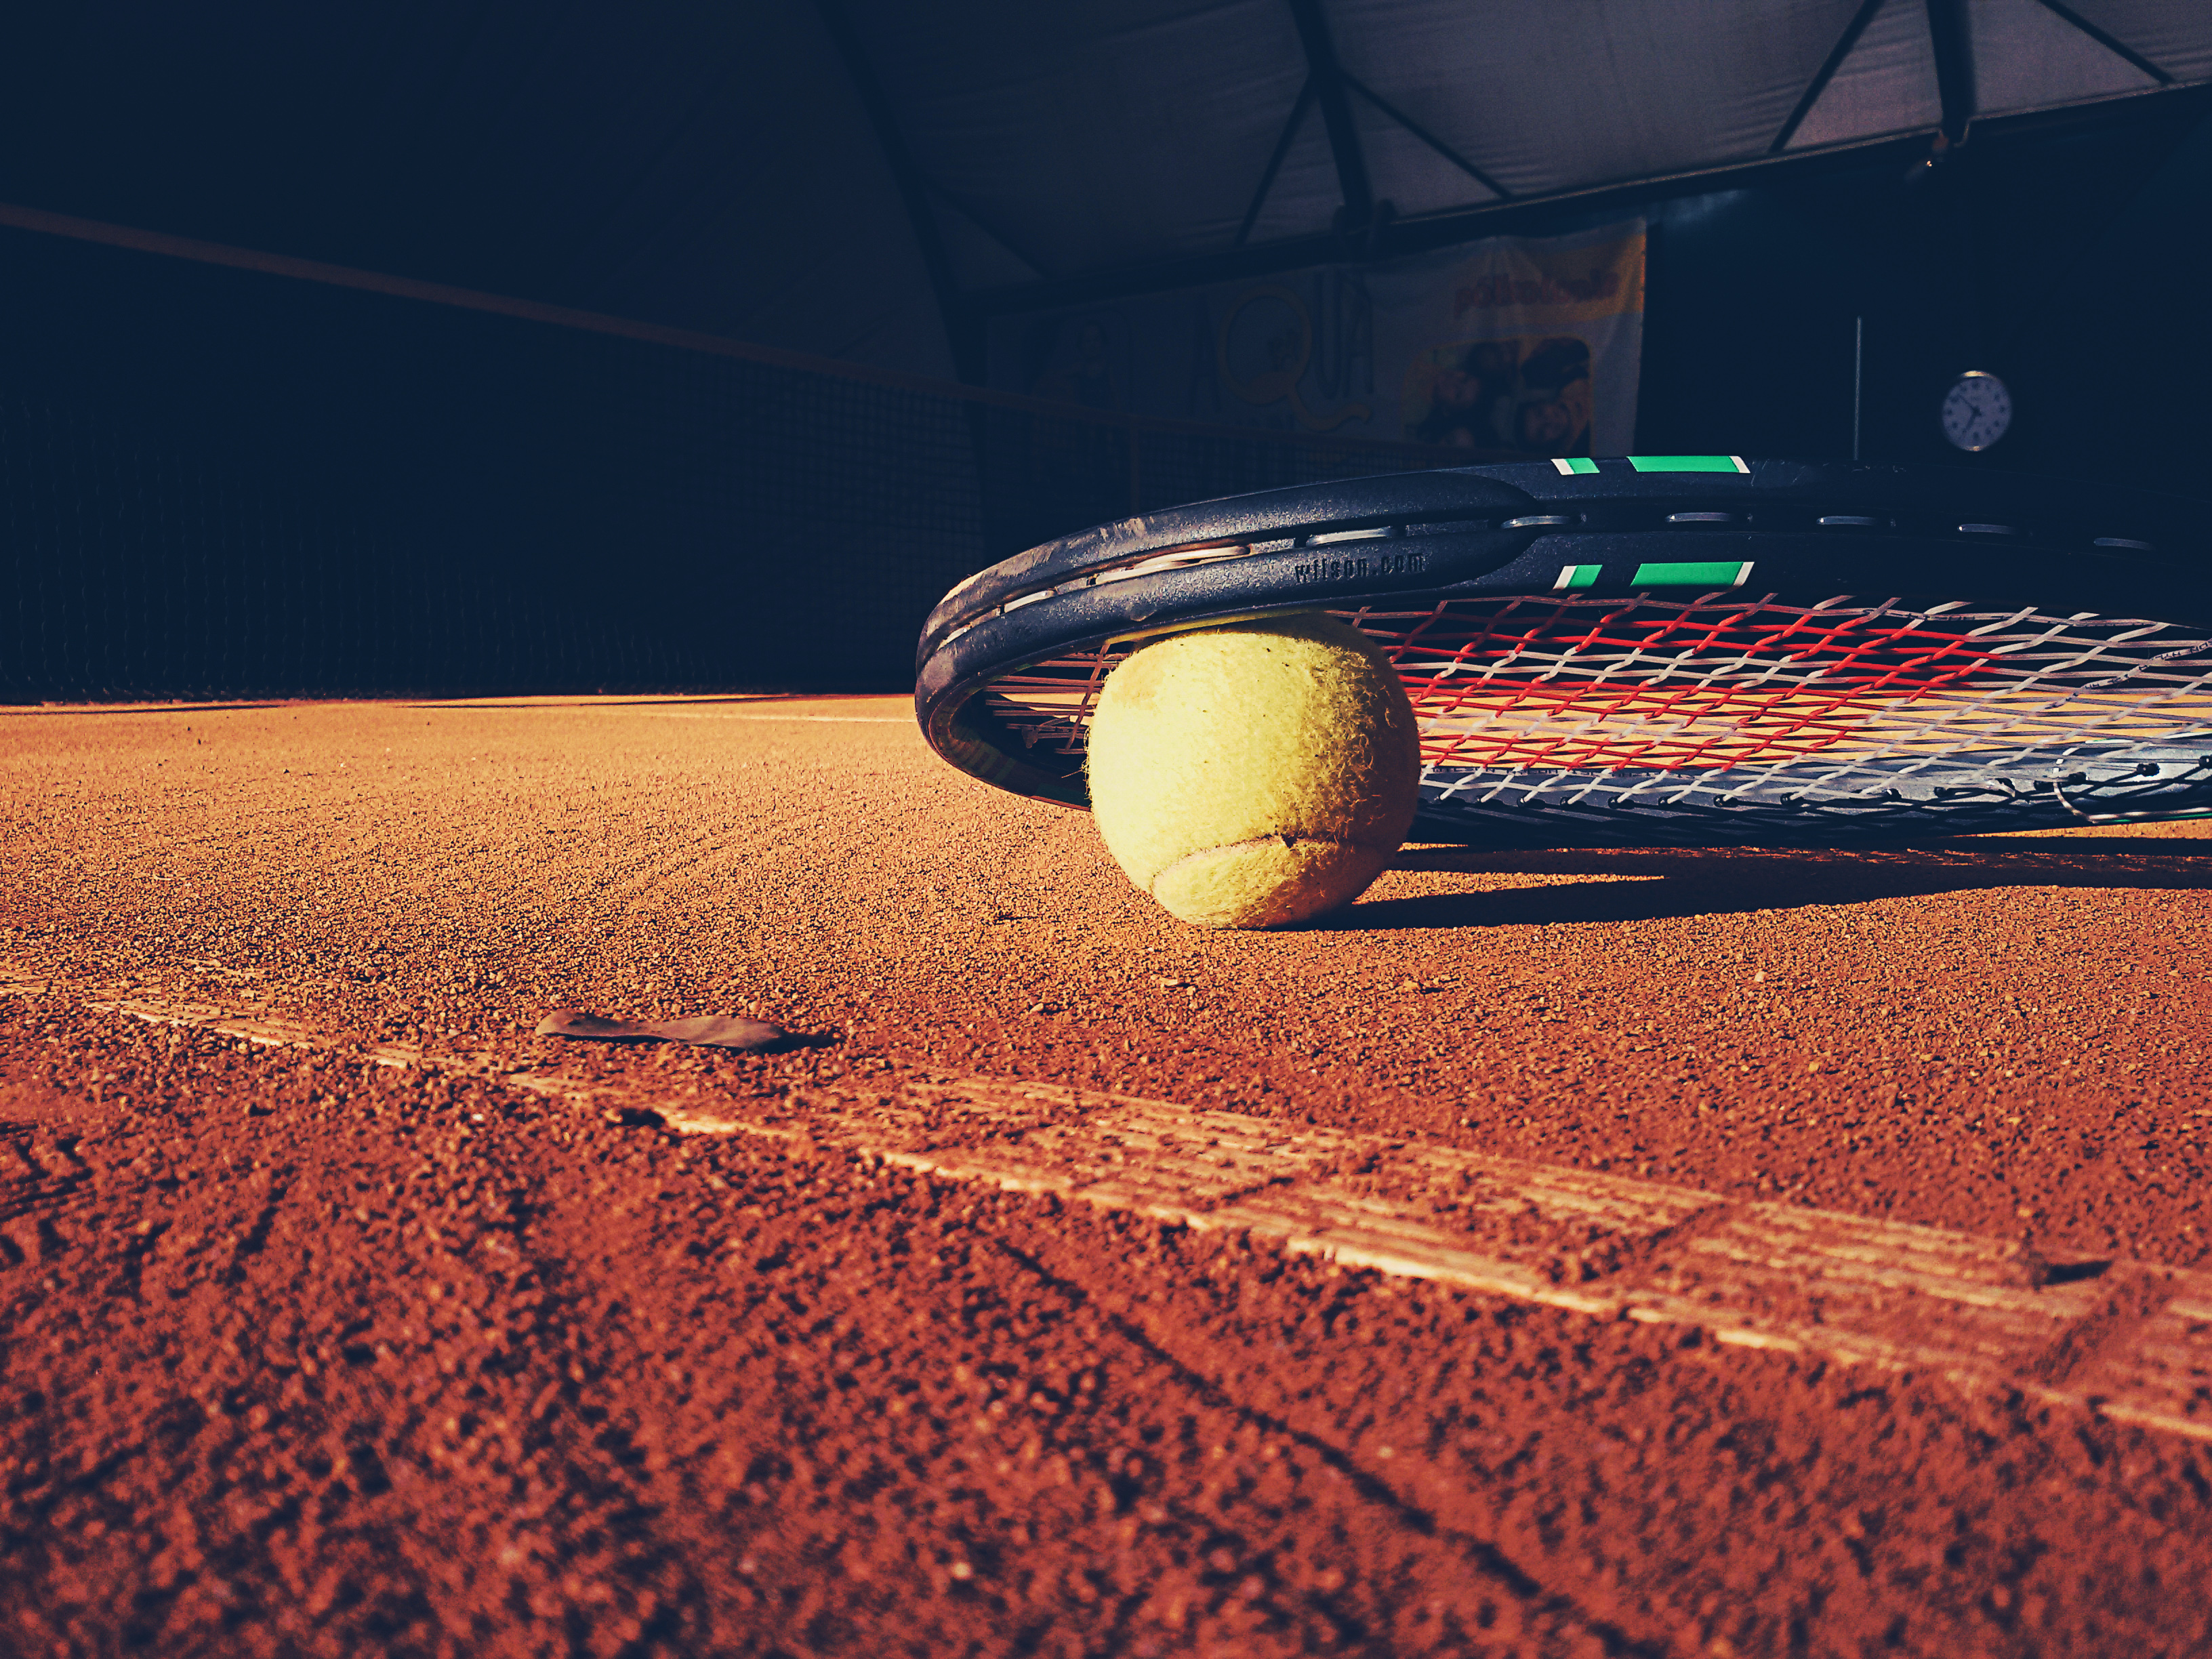 Tennis, or the art of losing